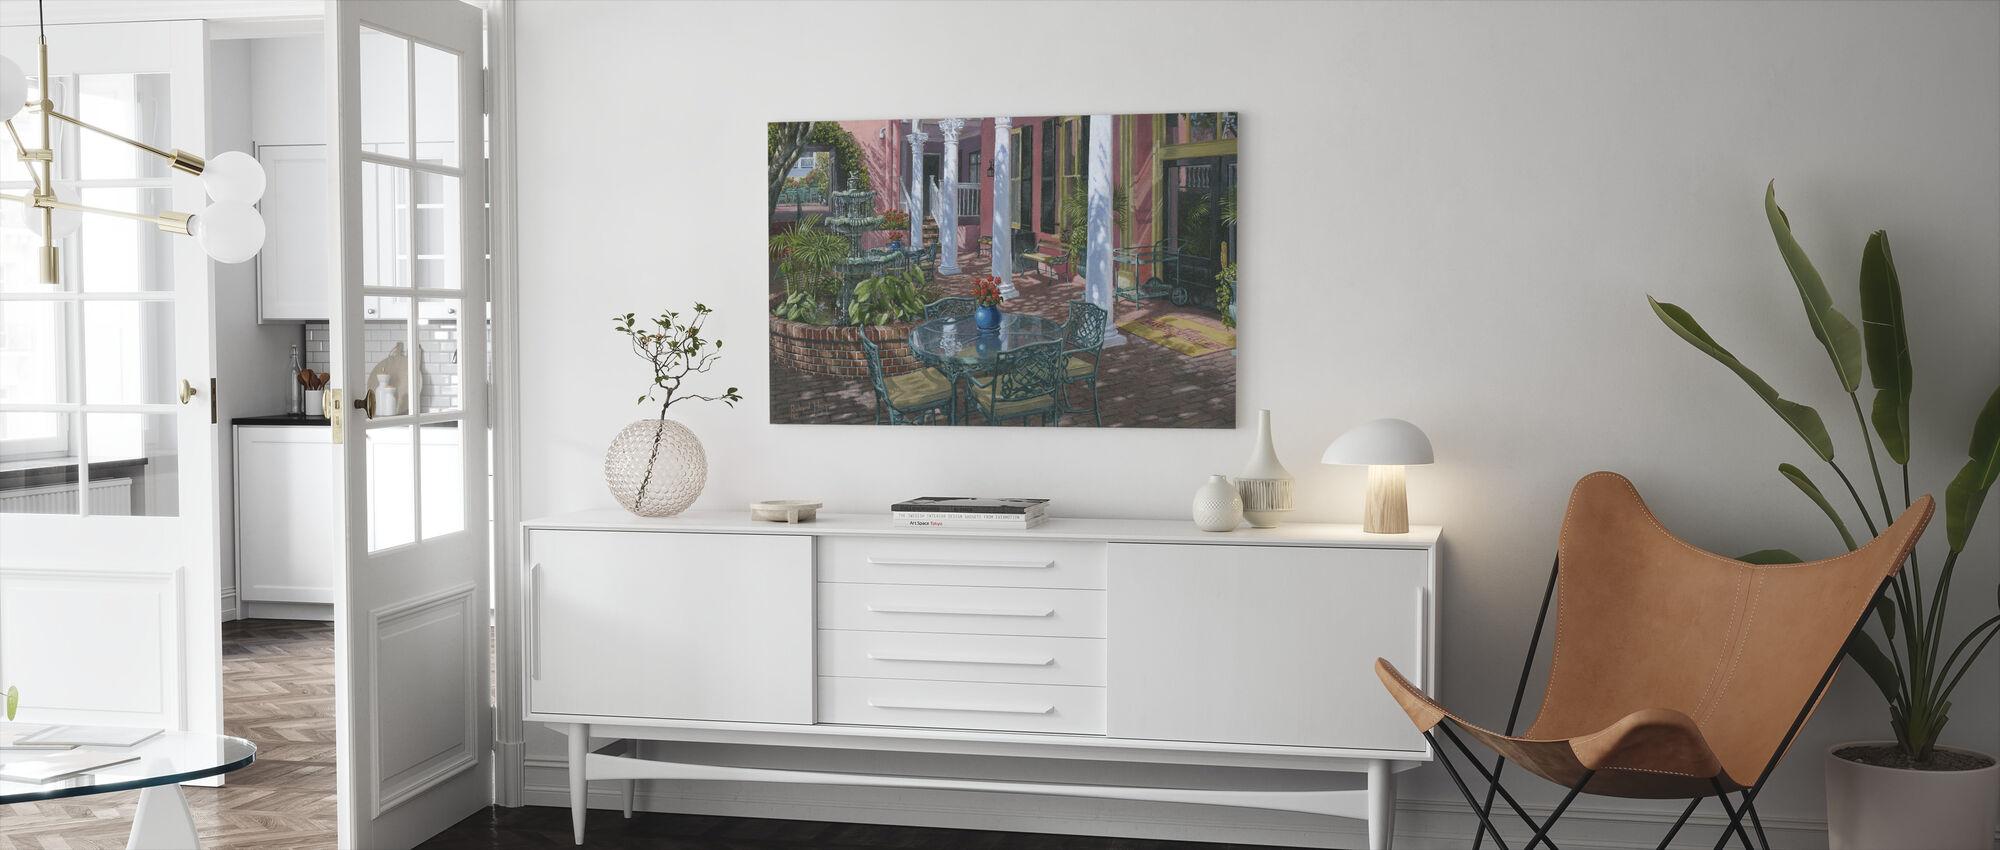 Mötesplats Inn Charleston - Canvastavla - Vardagsrum